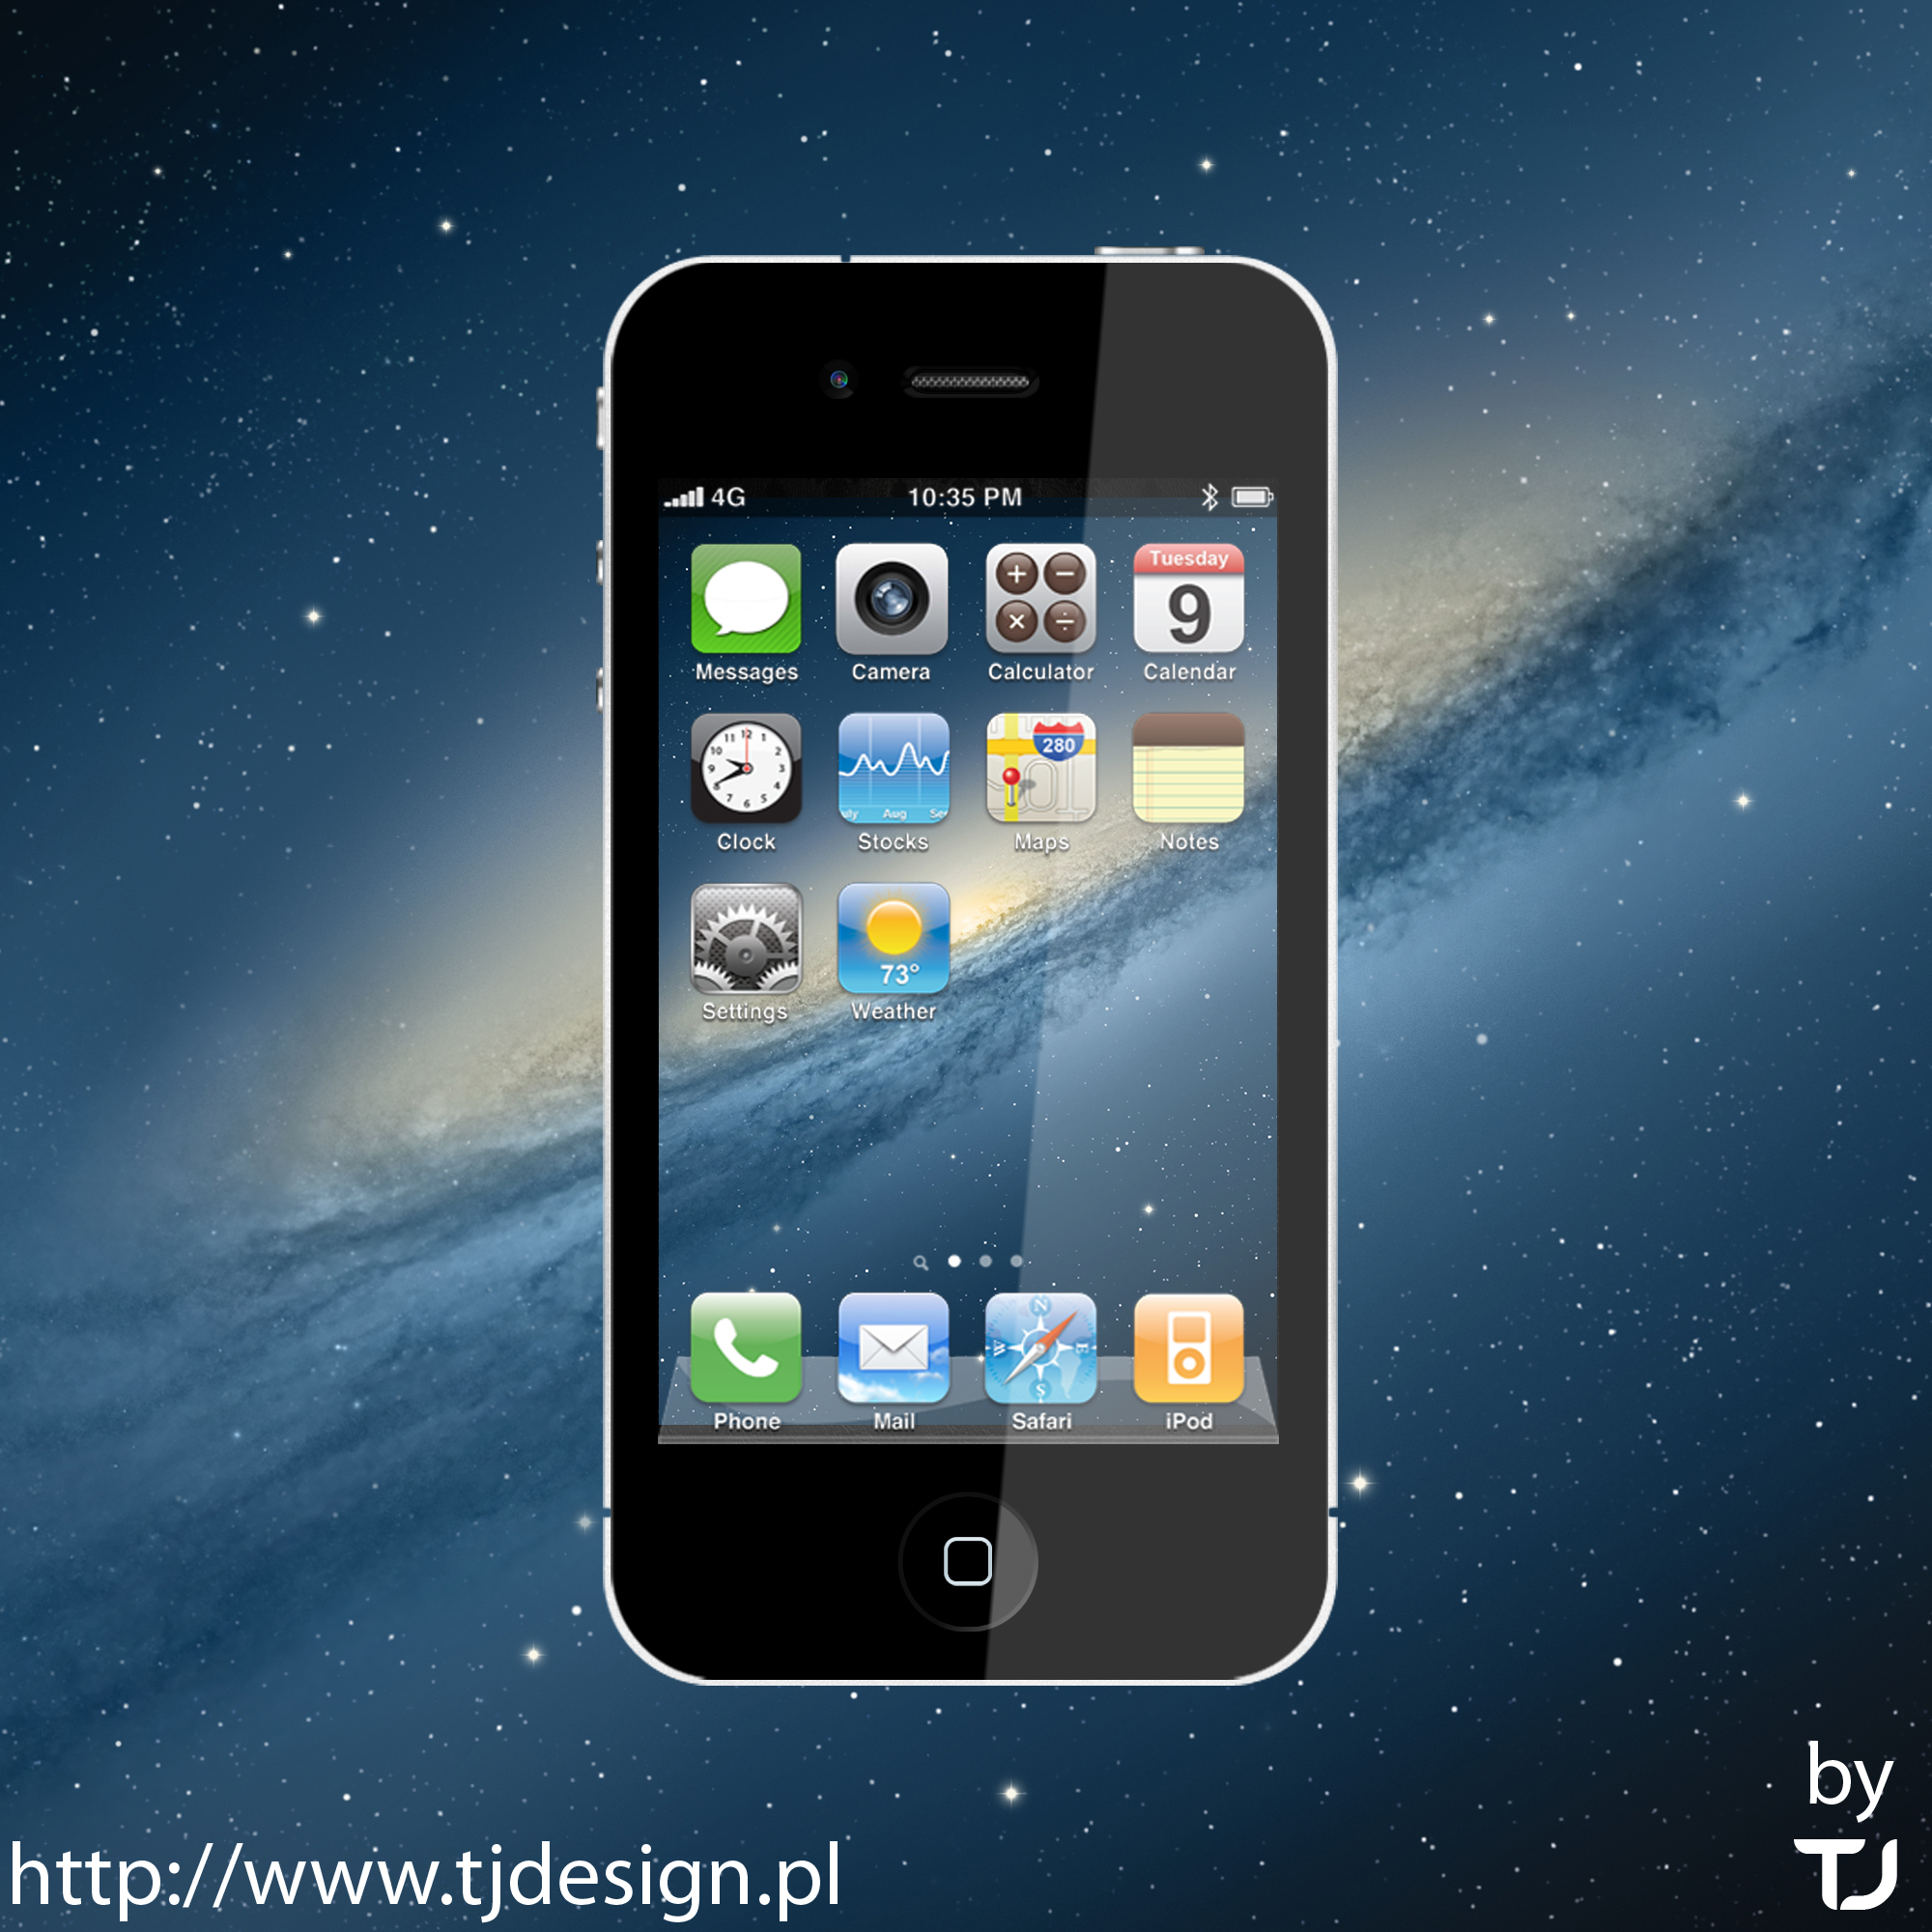 Mac Os X Mountain Lion Iphone Wallpaper Hd By T0j On Deviantart